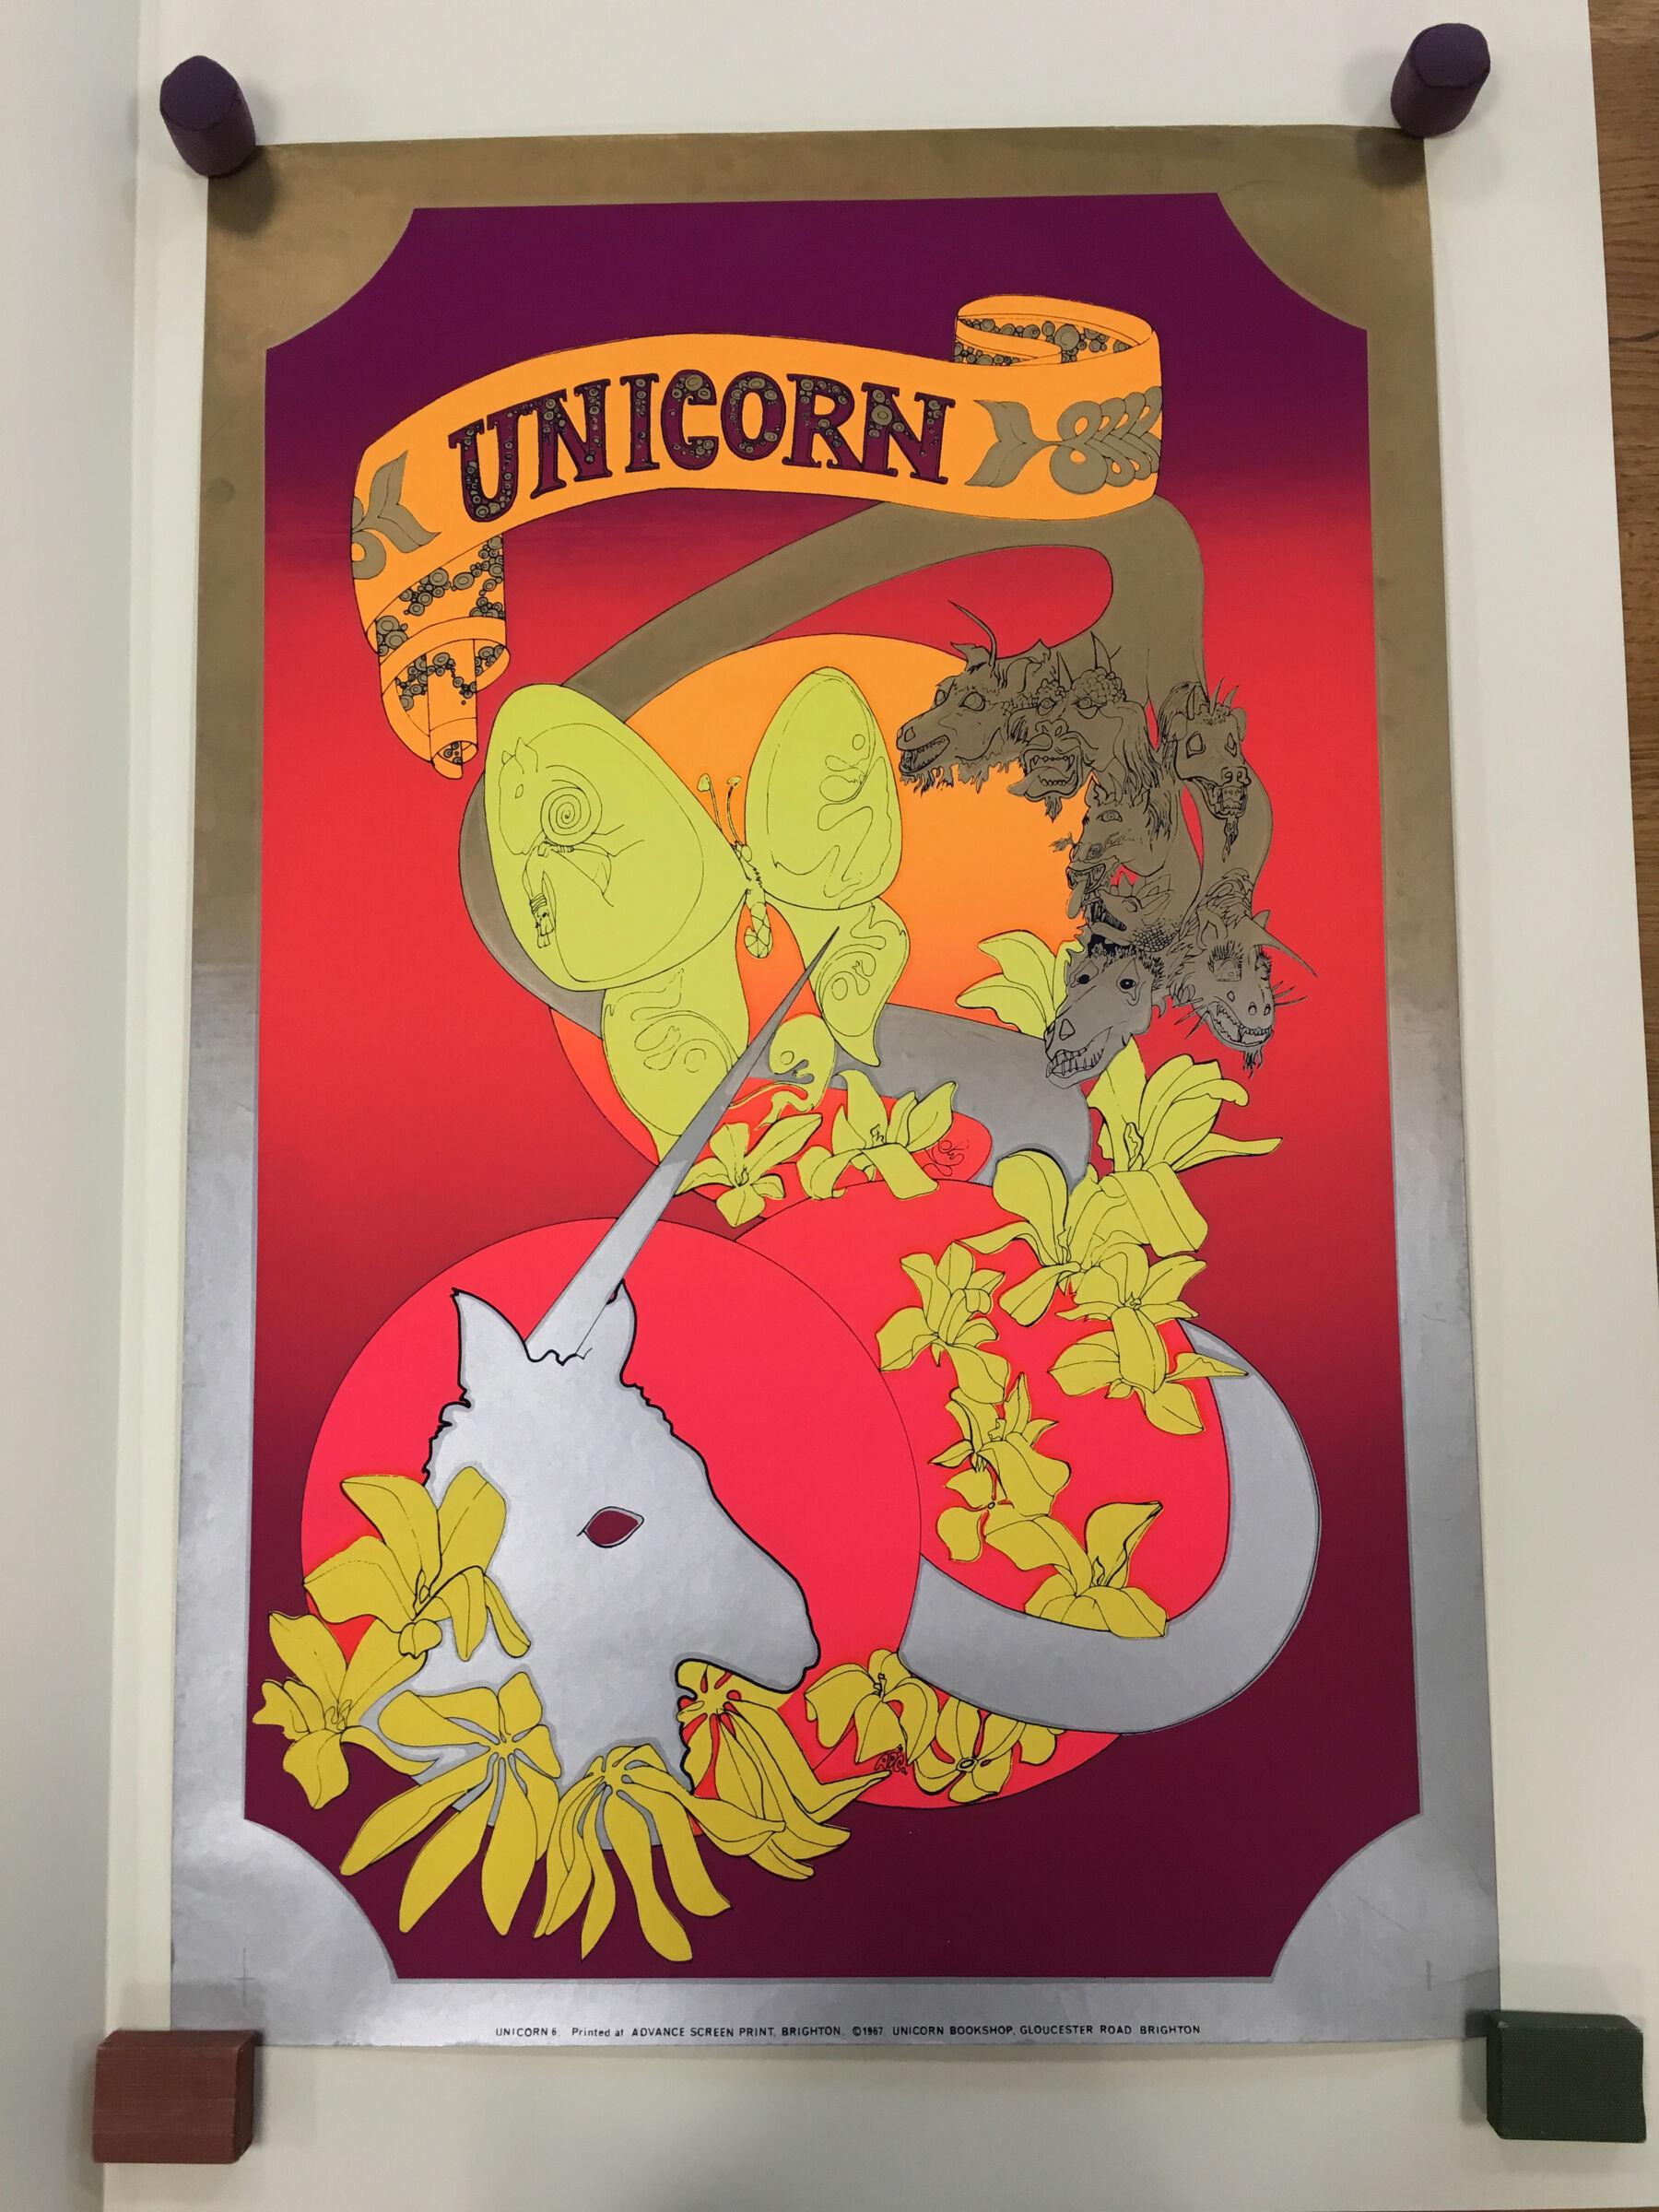 Unicorn, advance screen printing, Unicorn Bookshop, Brighton : silkscreen poster, 1967